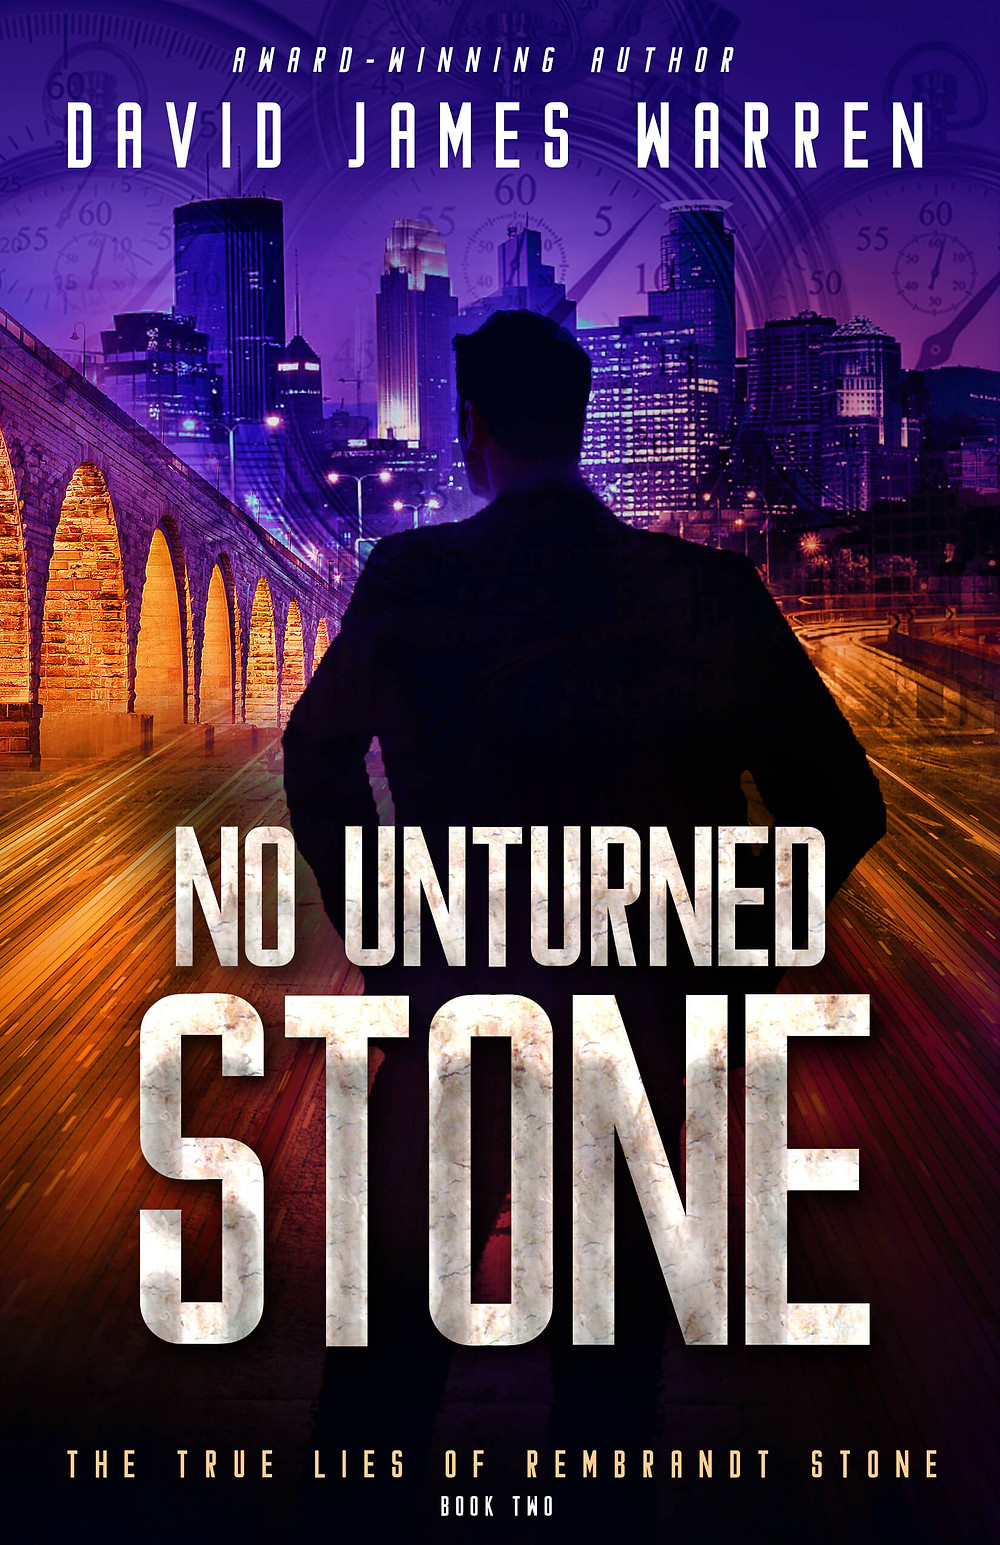 NO STONE UNTURNED by David James Warren